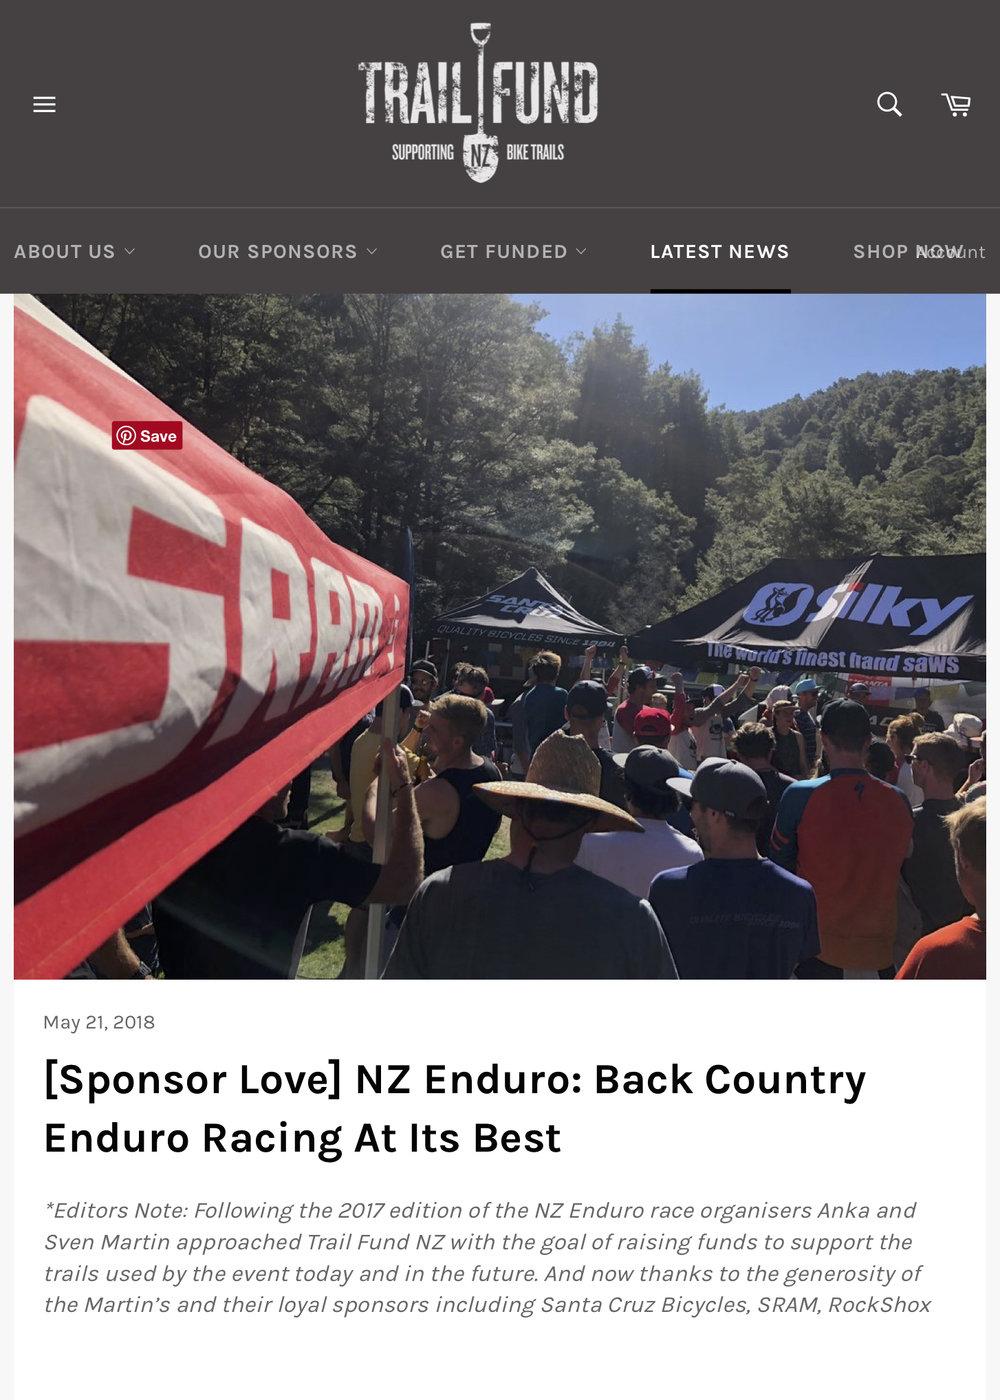 [Sponsor Love] NZ Enduro: Back Country Enduro Racing At Its Best – Trail Fund.jpg